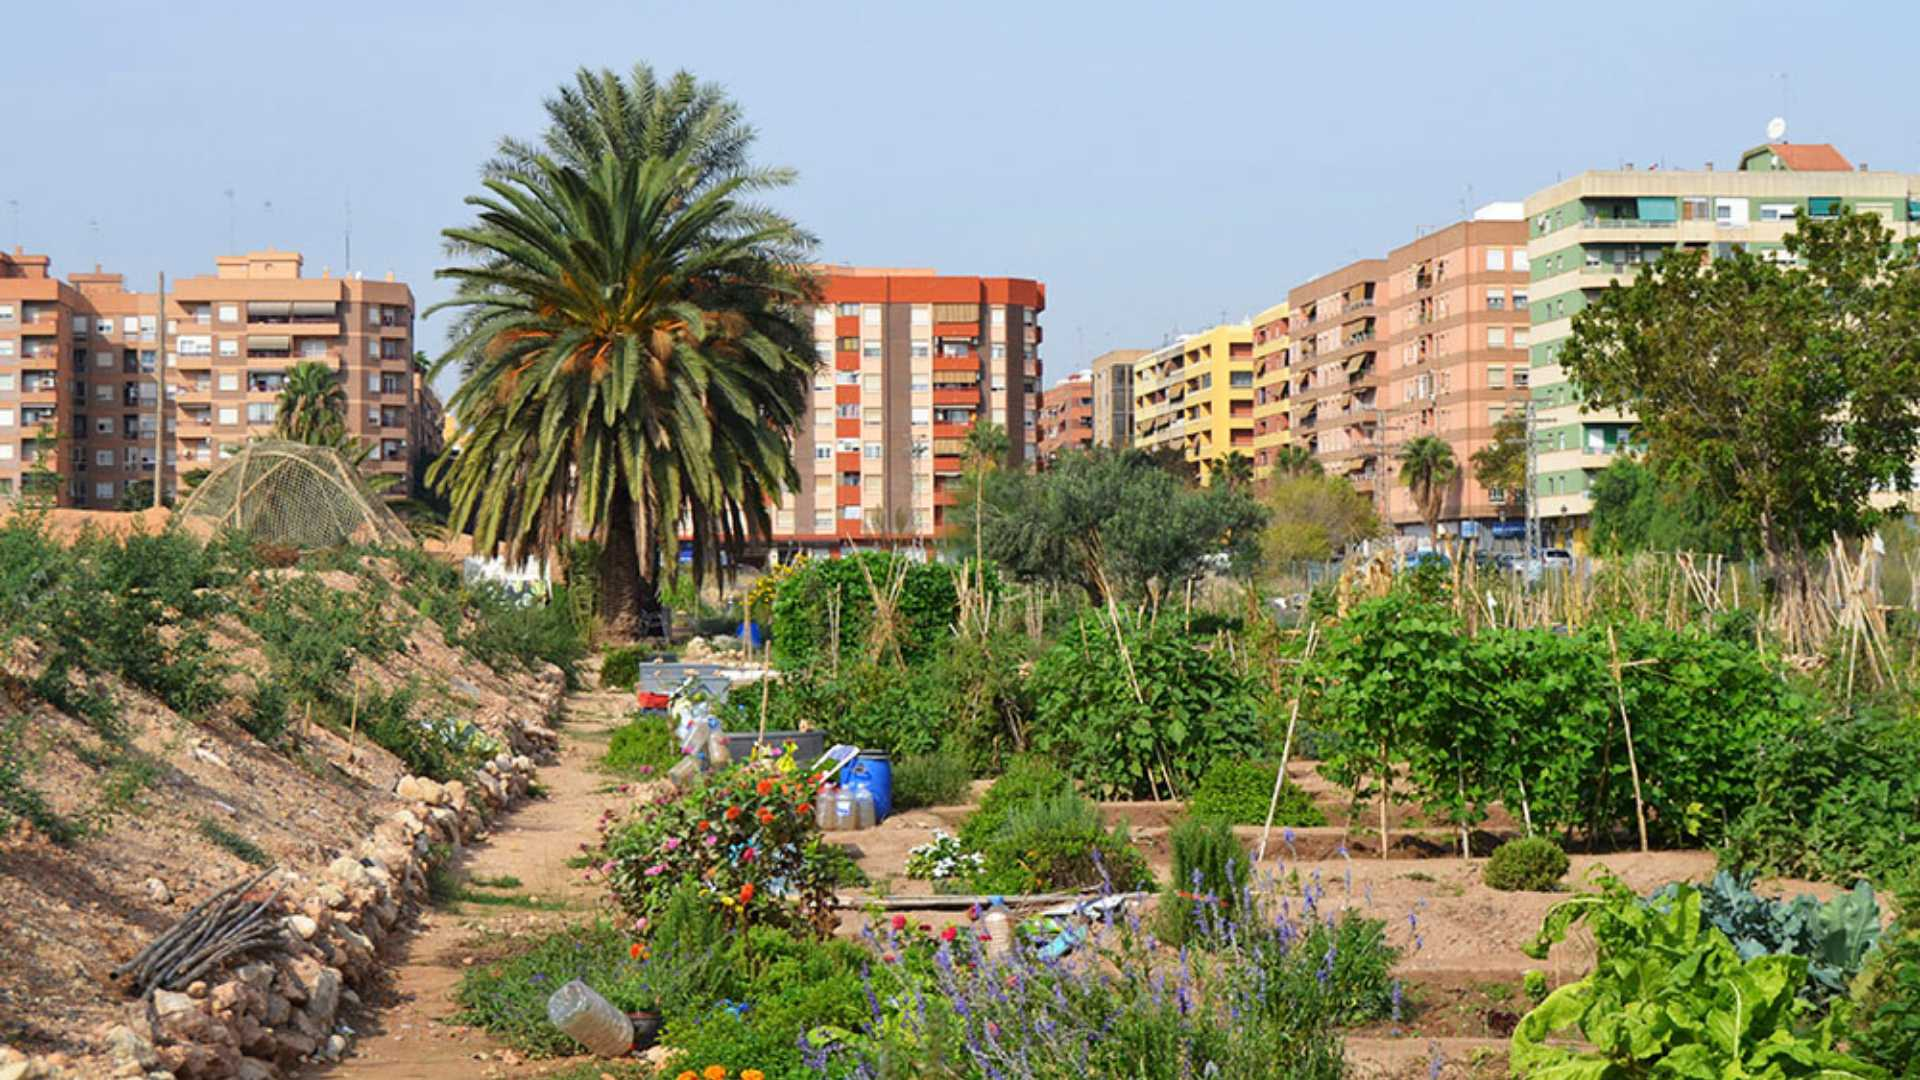 Benimaclet: poble i barri